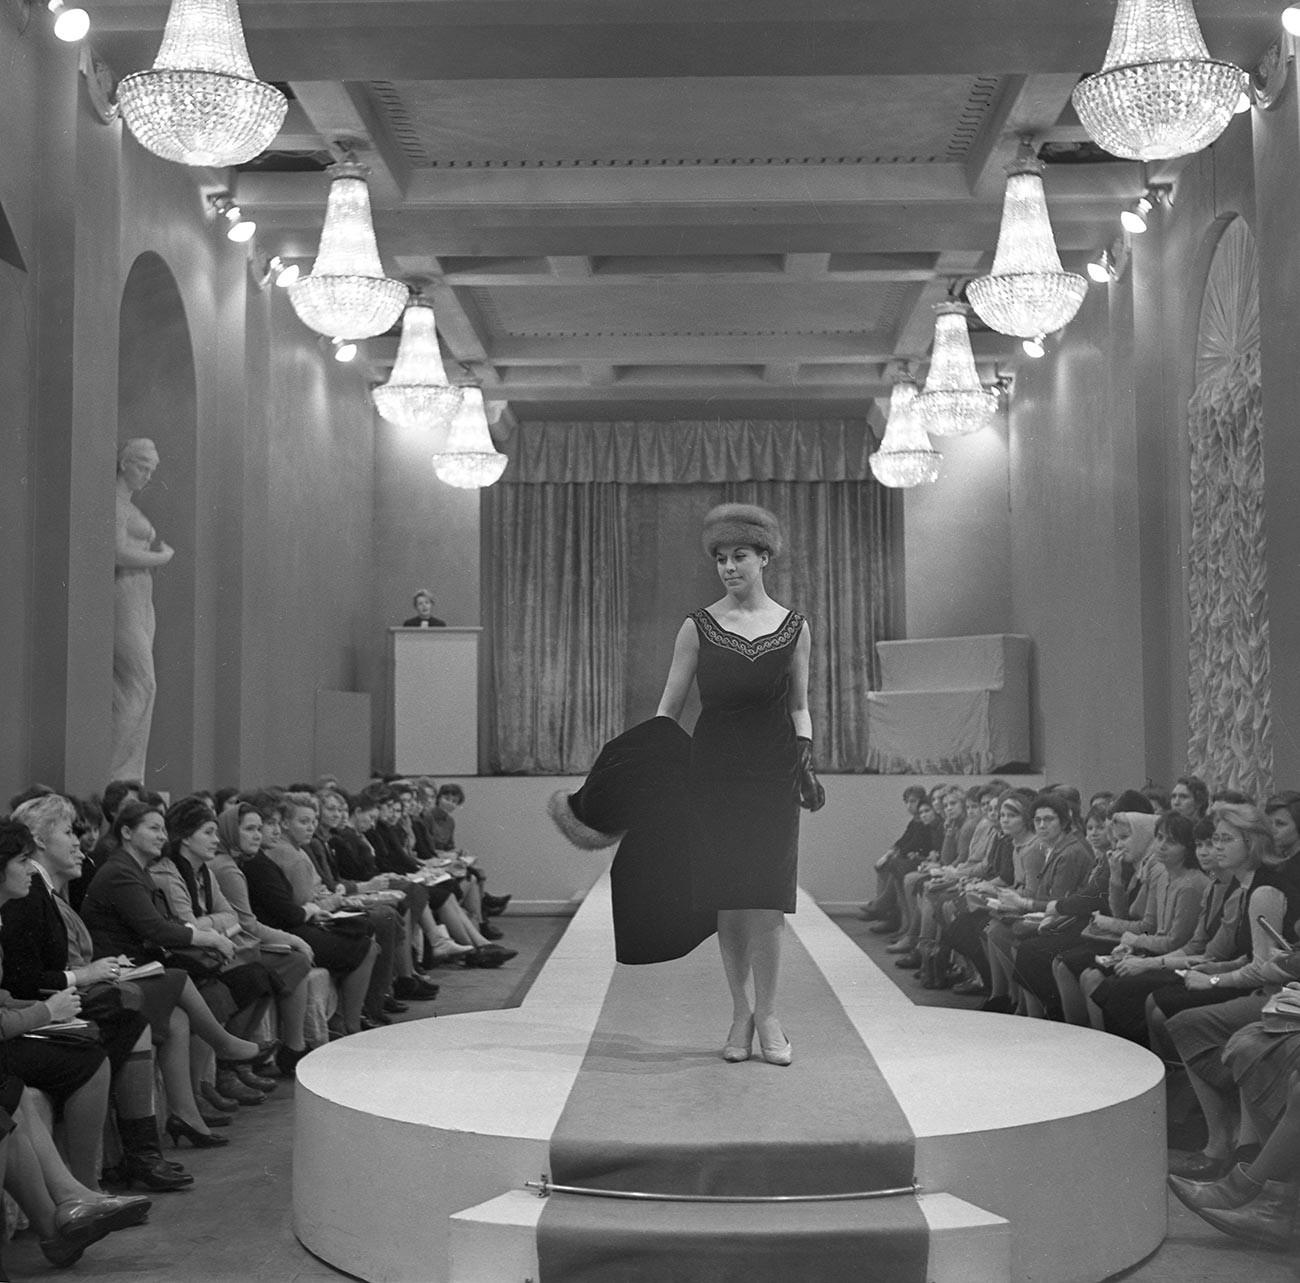 Präsentation der neuen Frühjahrskollektion bei dem Leningrader Modehaus (LDMO), 1965.